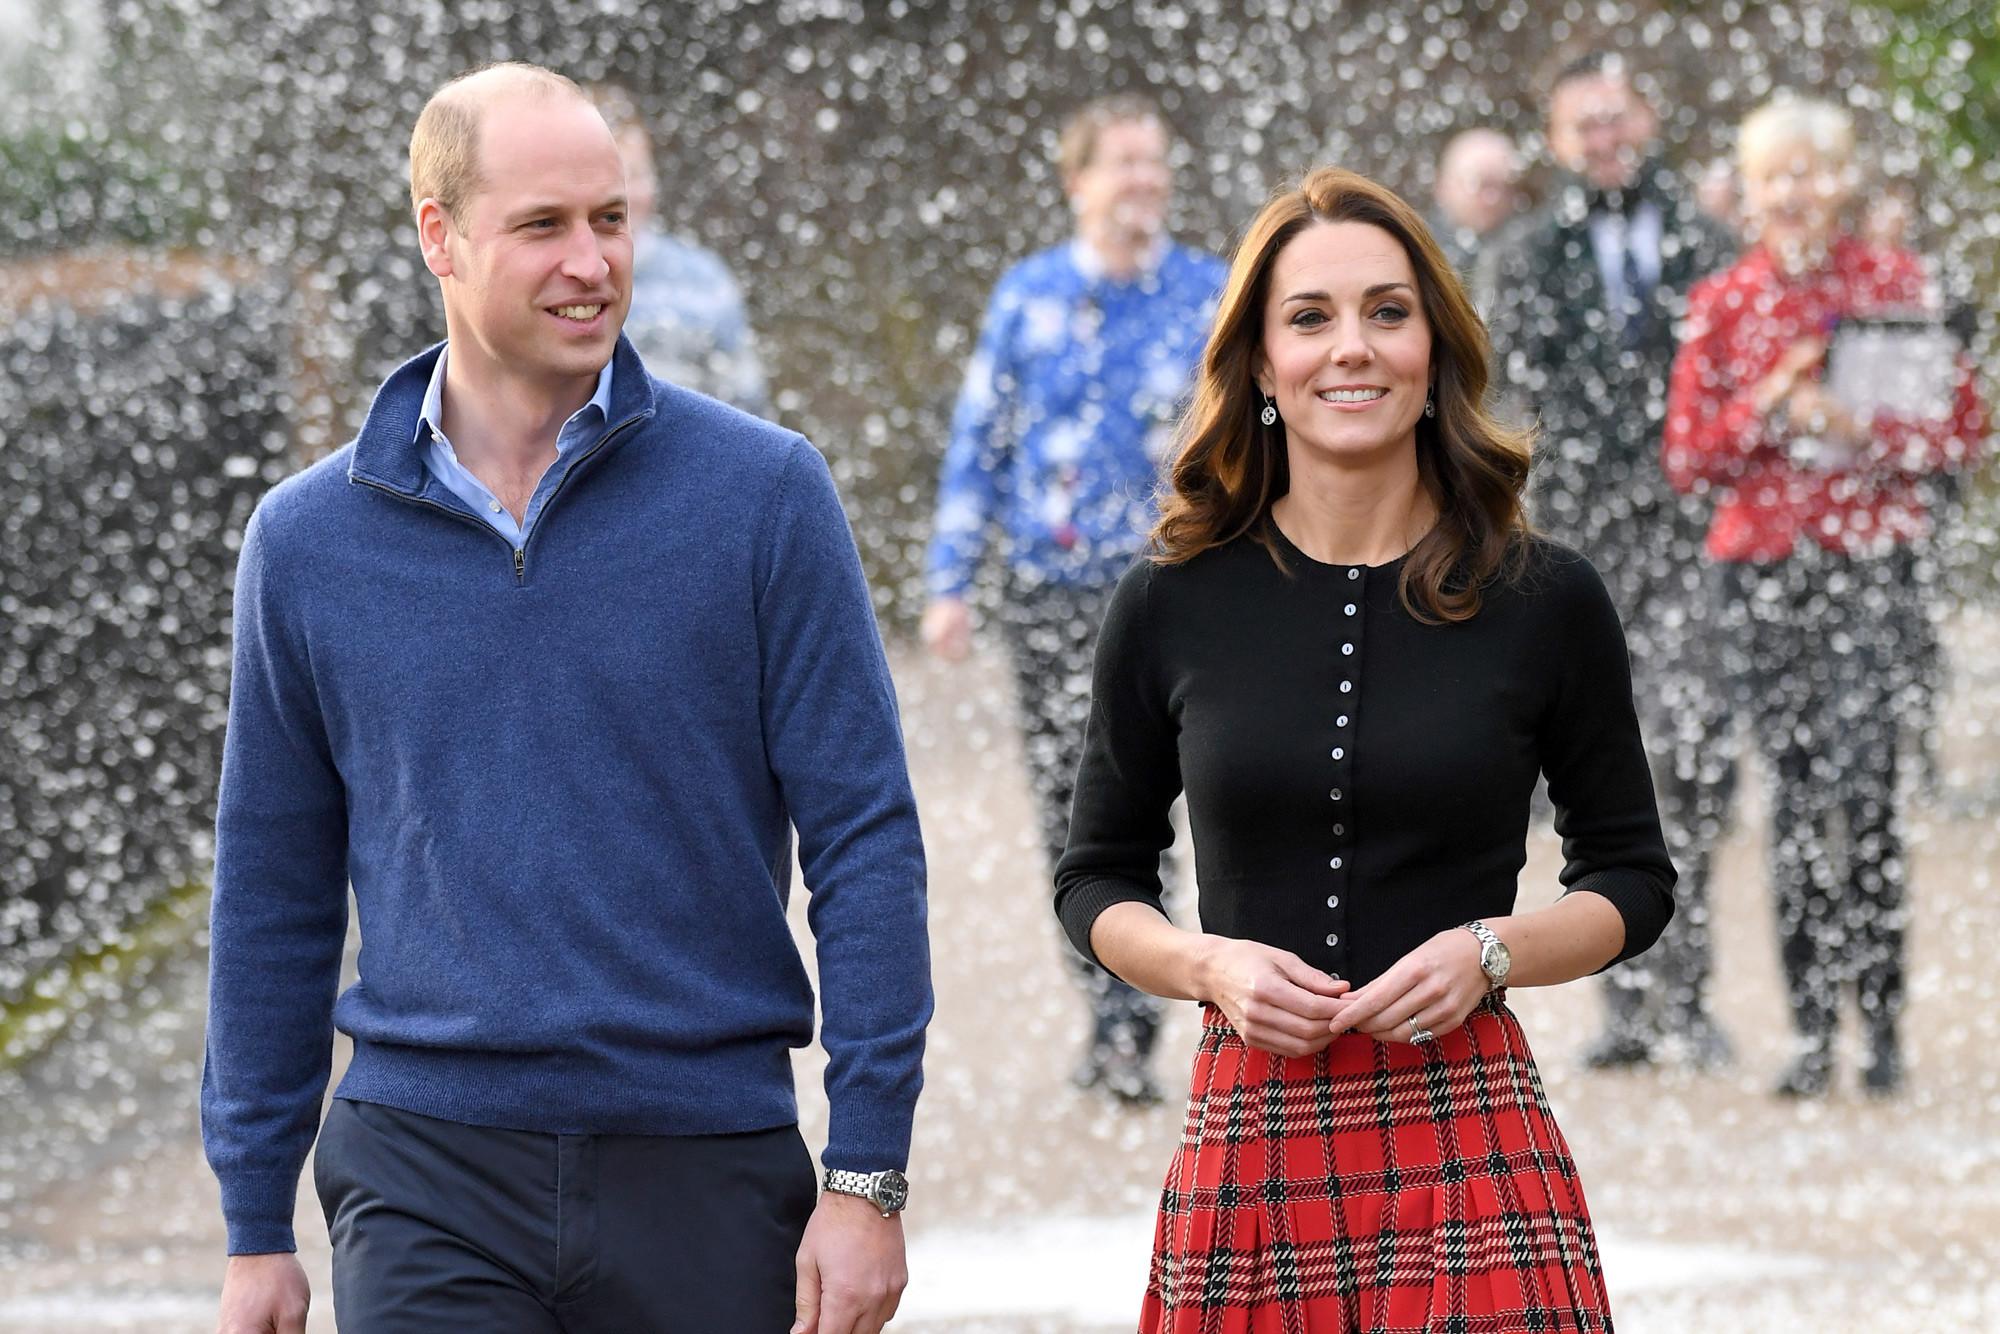 Kate Middleton nails Christmas style in thousand-dollar plaid